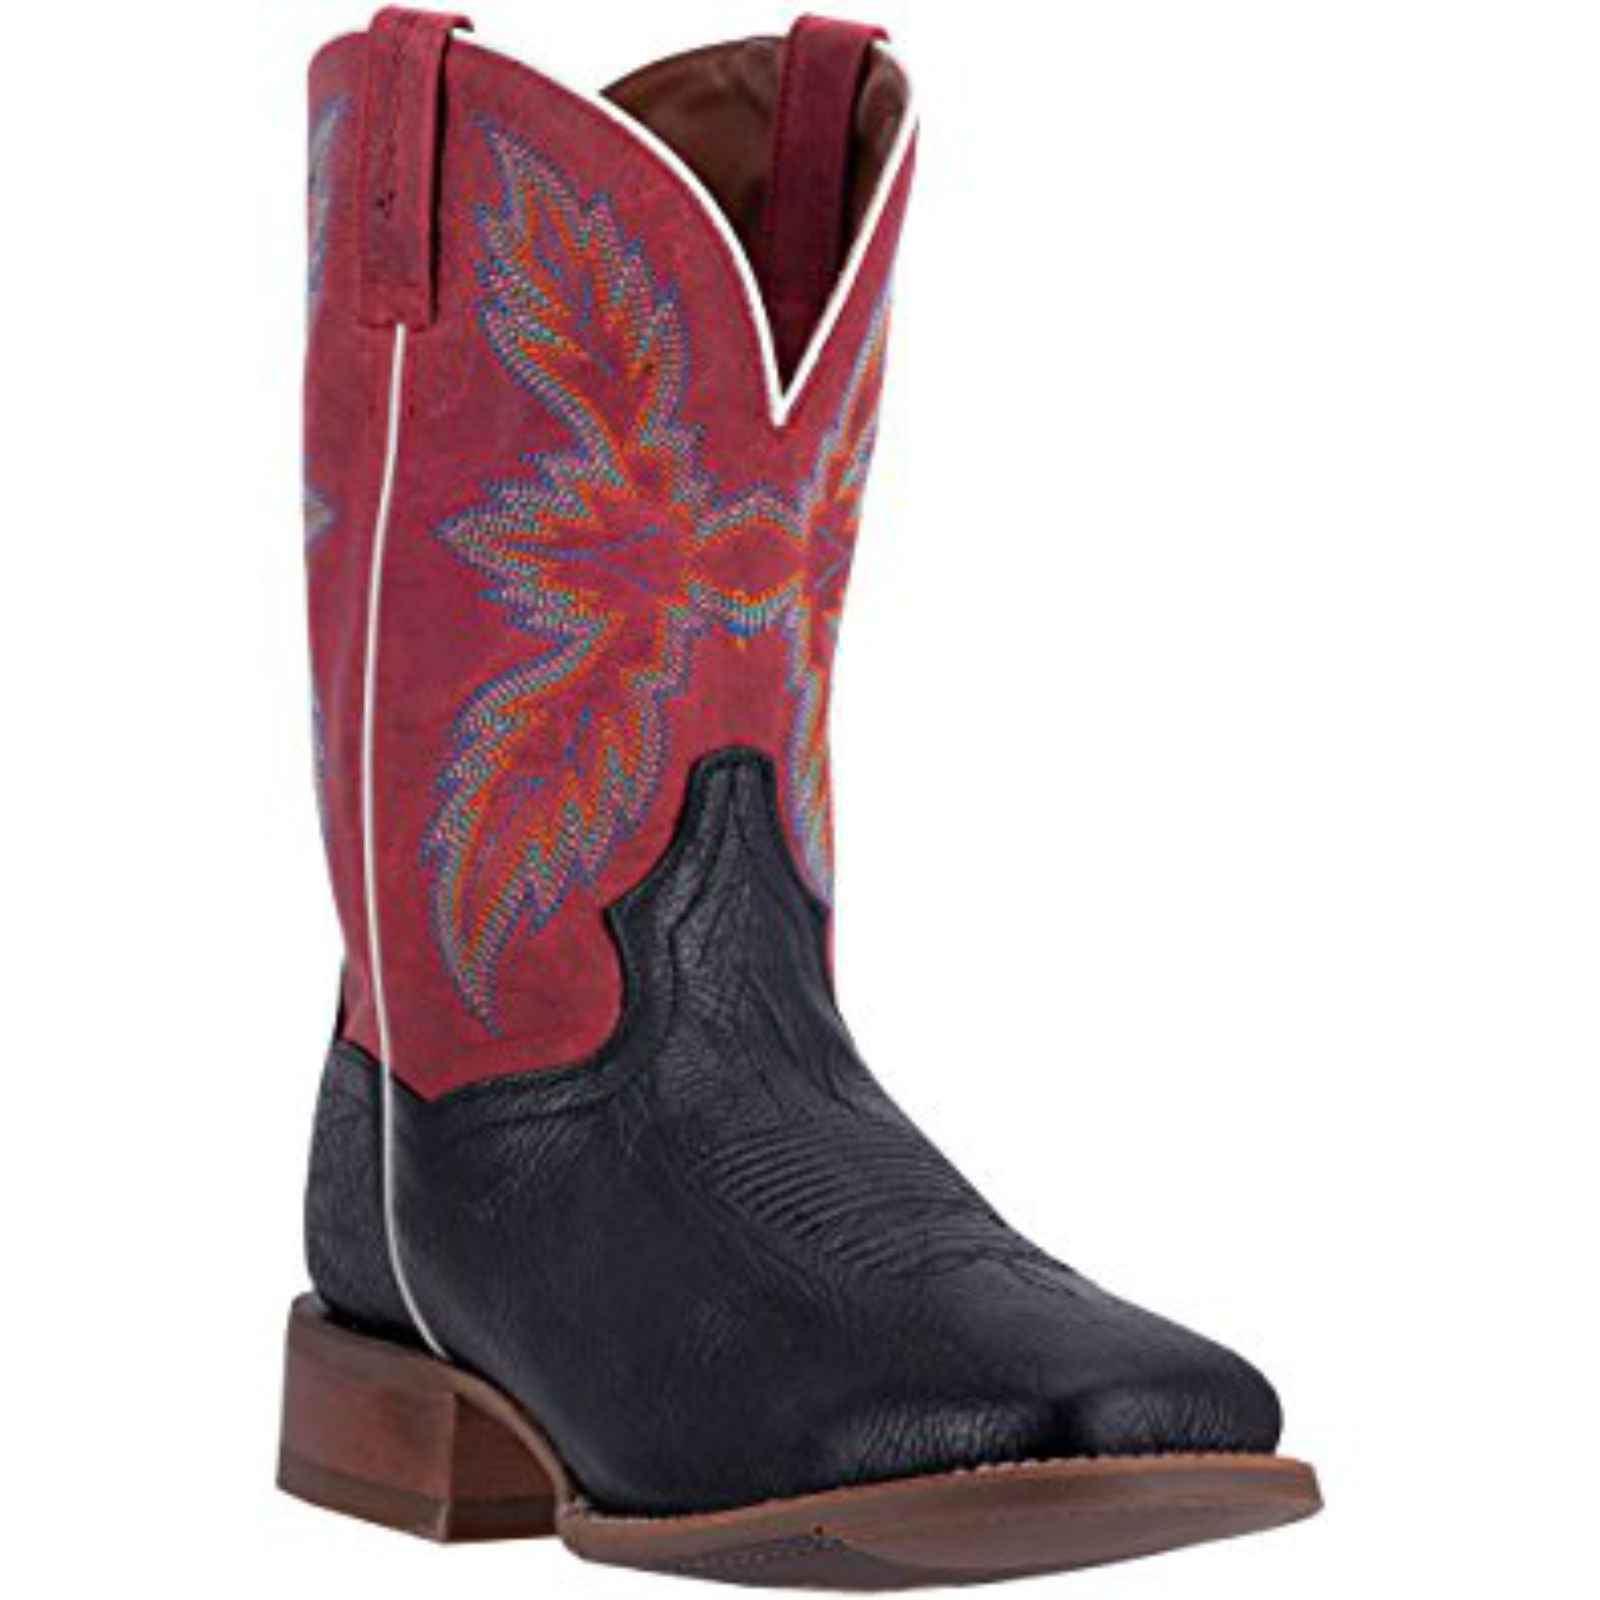 "Dan Post Men's 11"" Red Clark Black Leather Cowboy Boots,DP2424 by DAN POST"